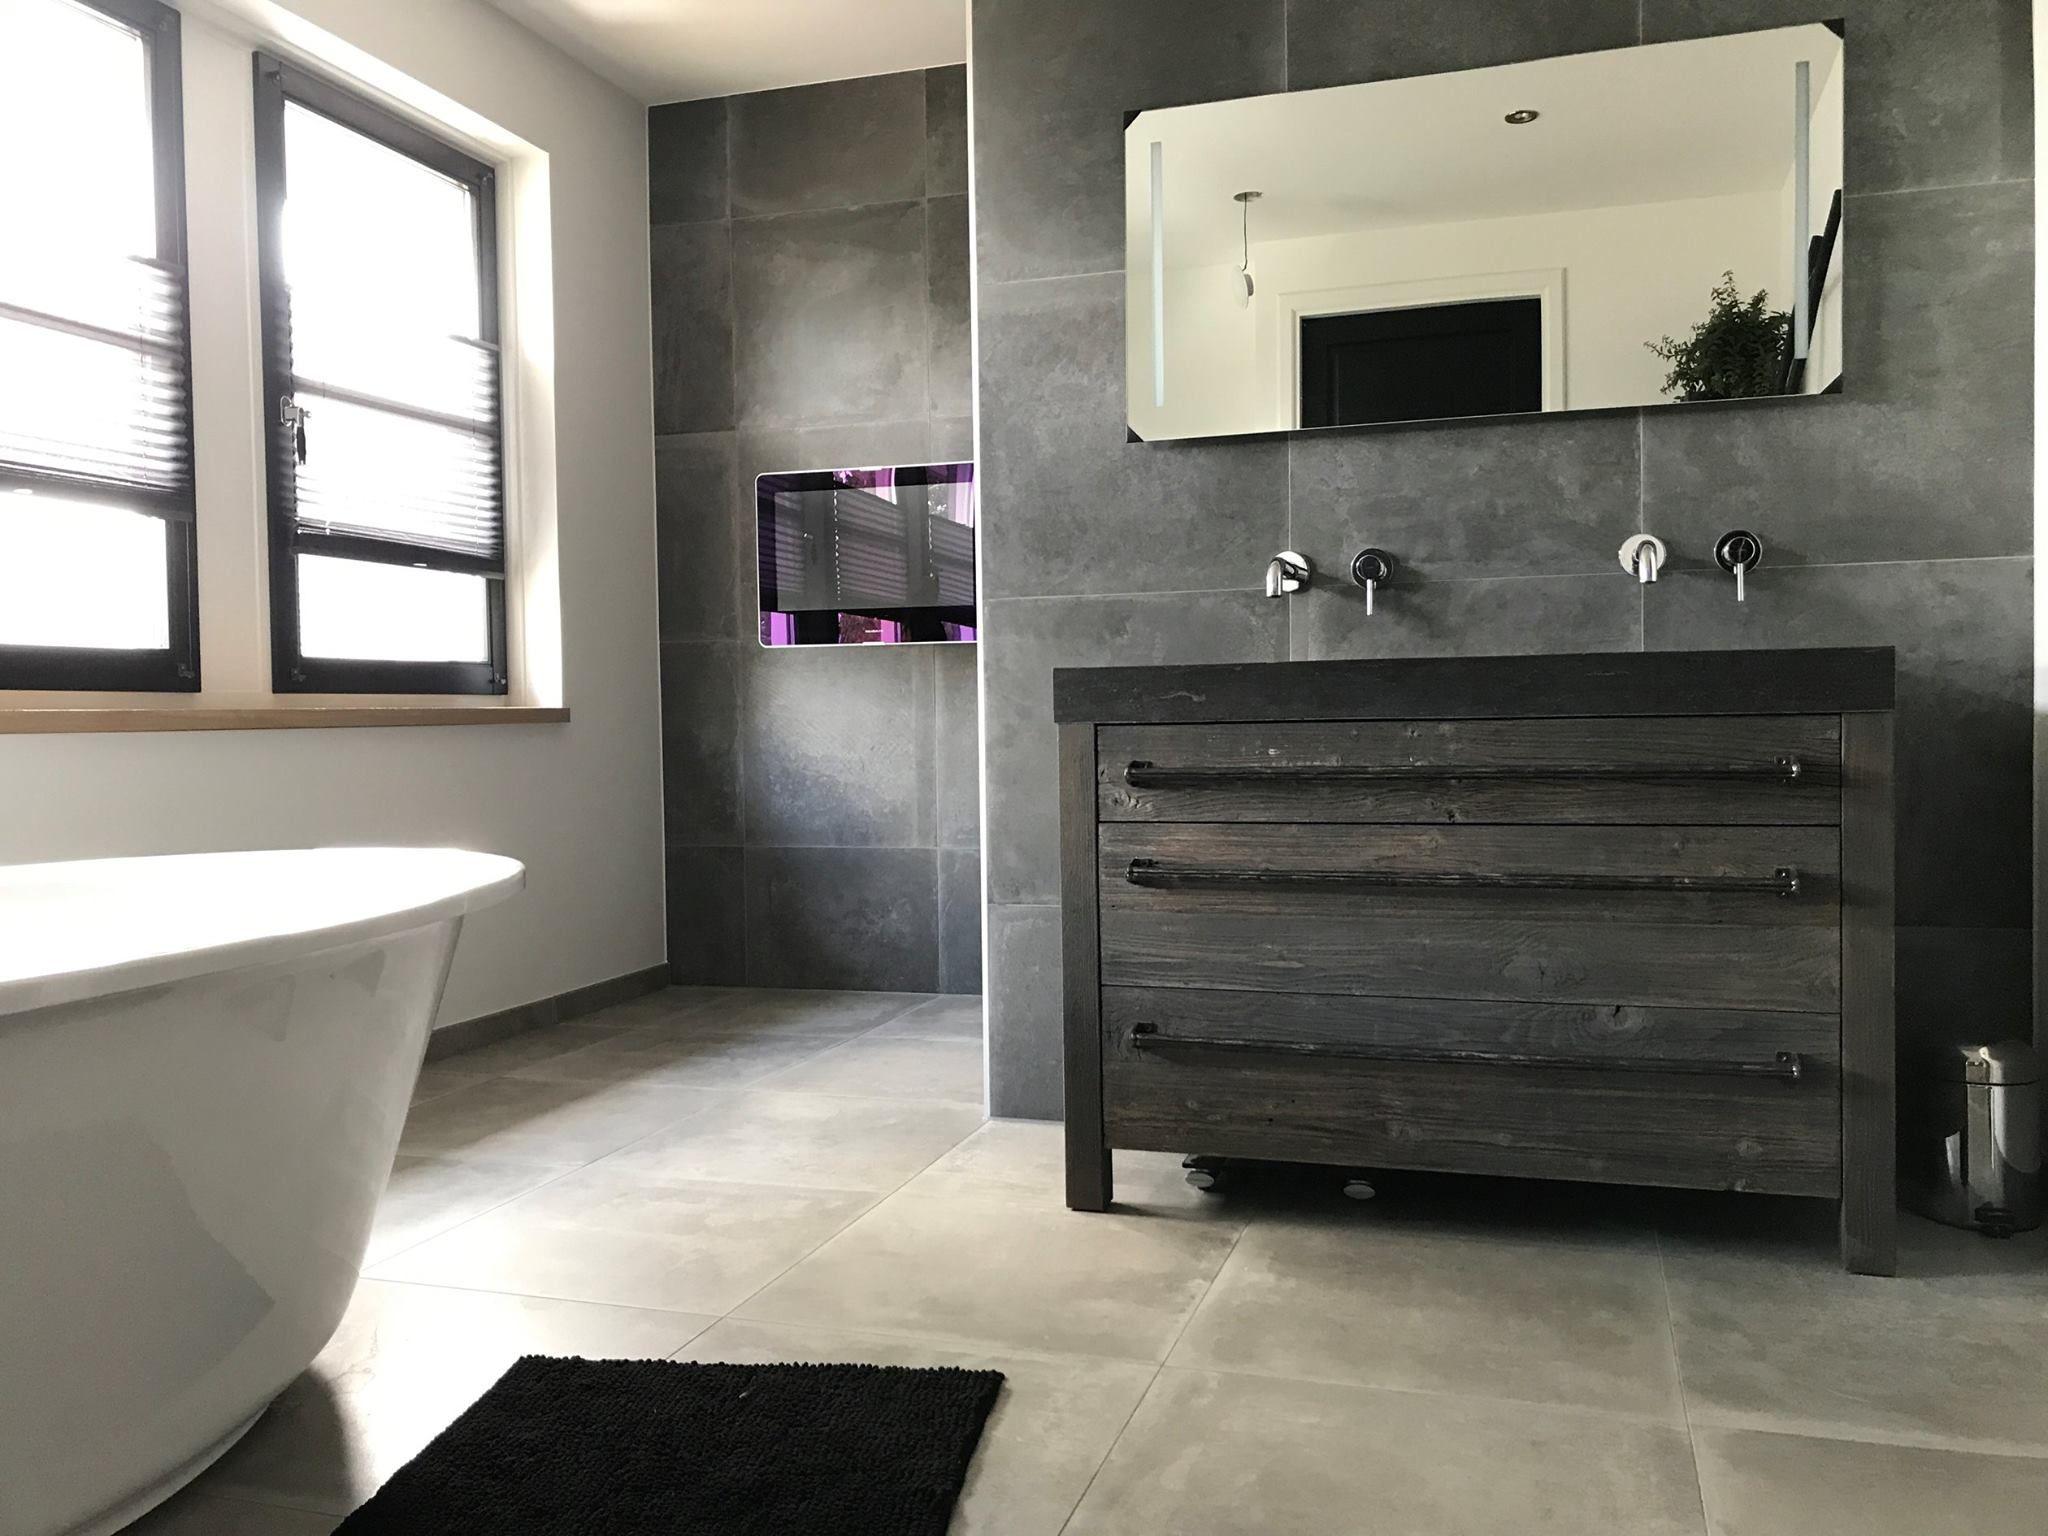 Badkamer Ideeen Hout : Badkamermeubel hout tegels badkamer en badkamermeubel